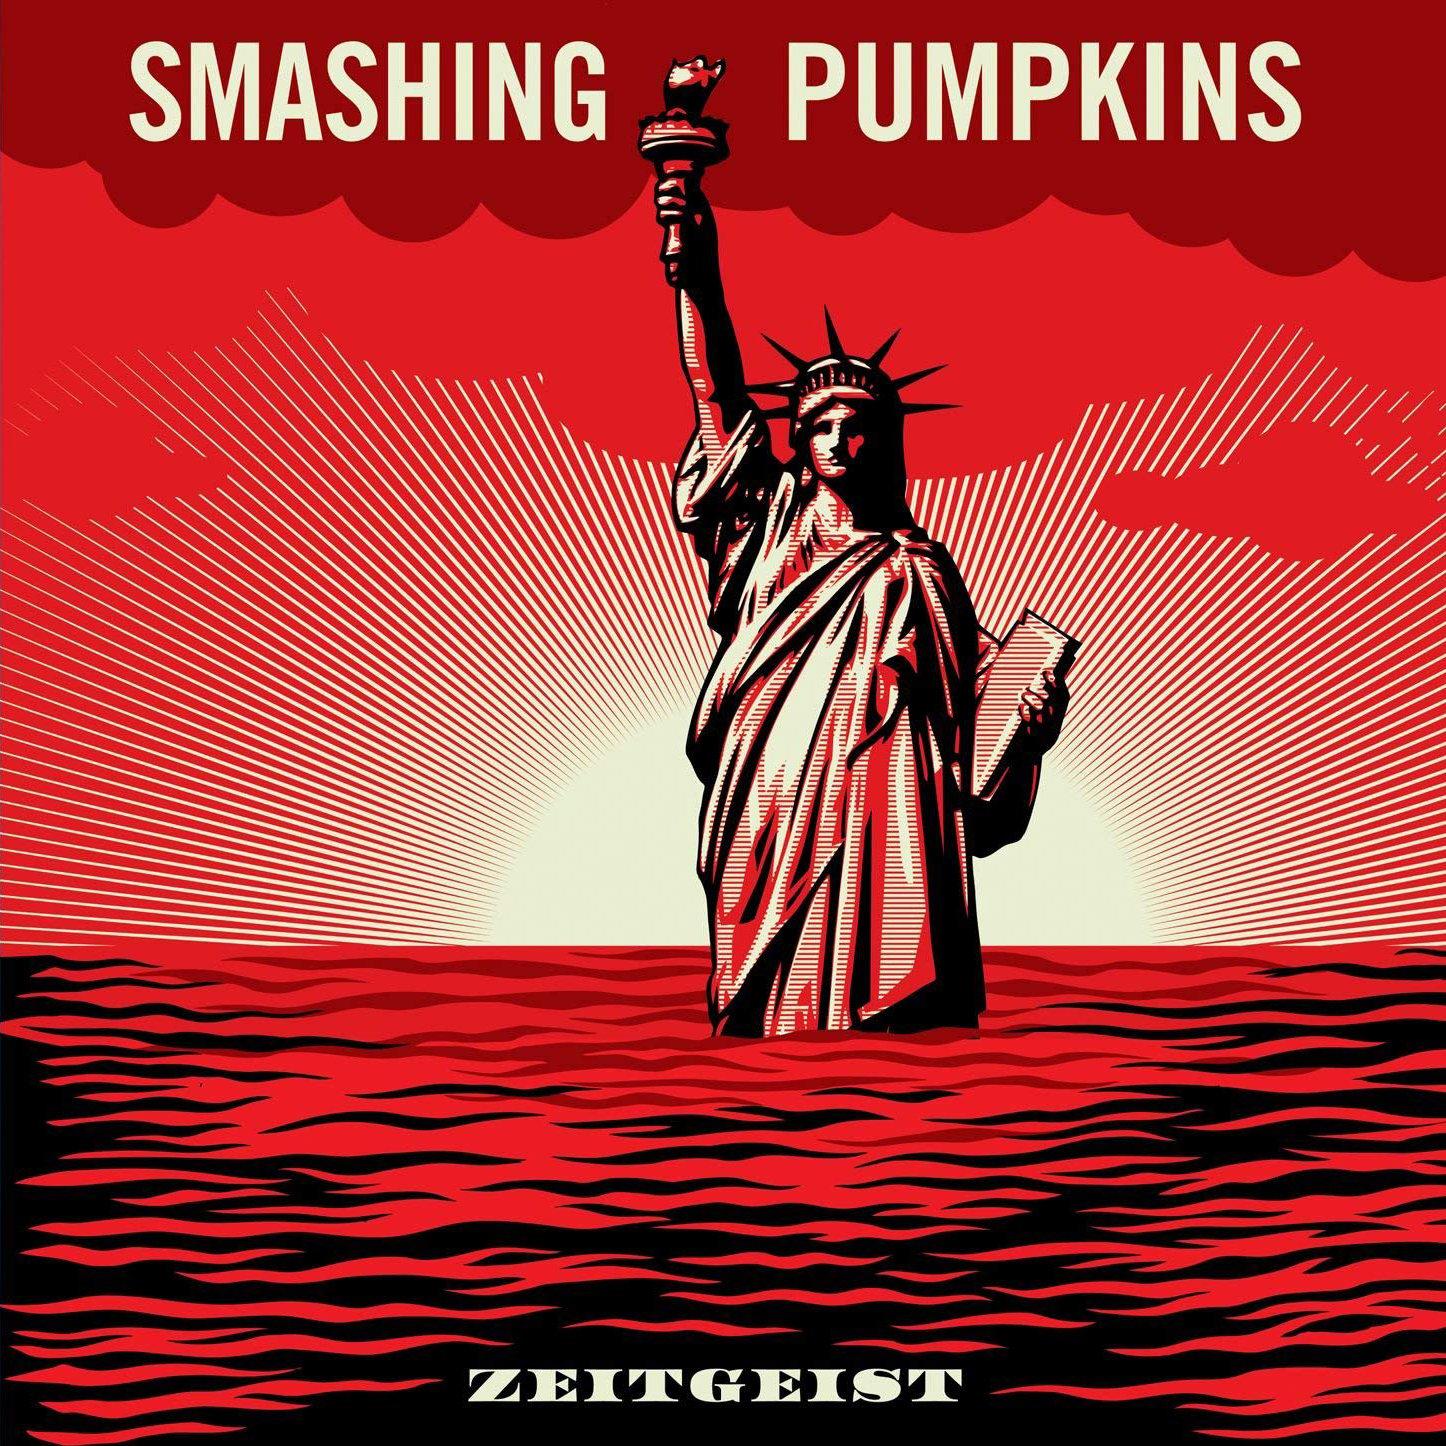 Review: Smashing Pumpkins, Zeitgeist - Slant Magazine